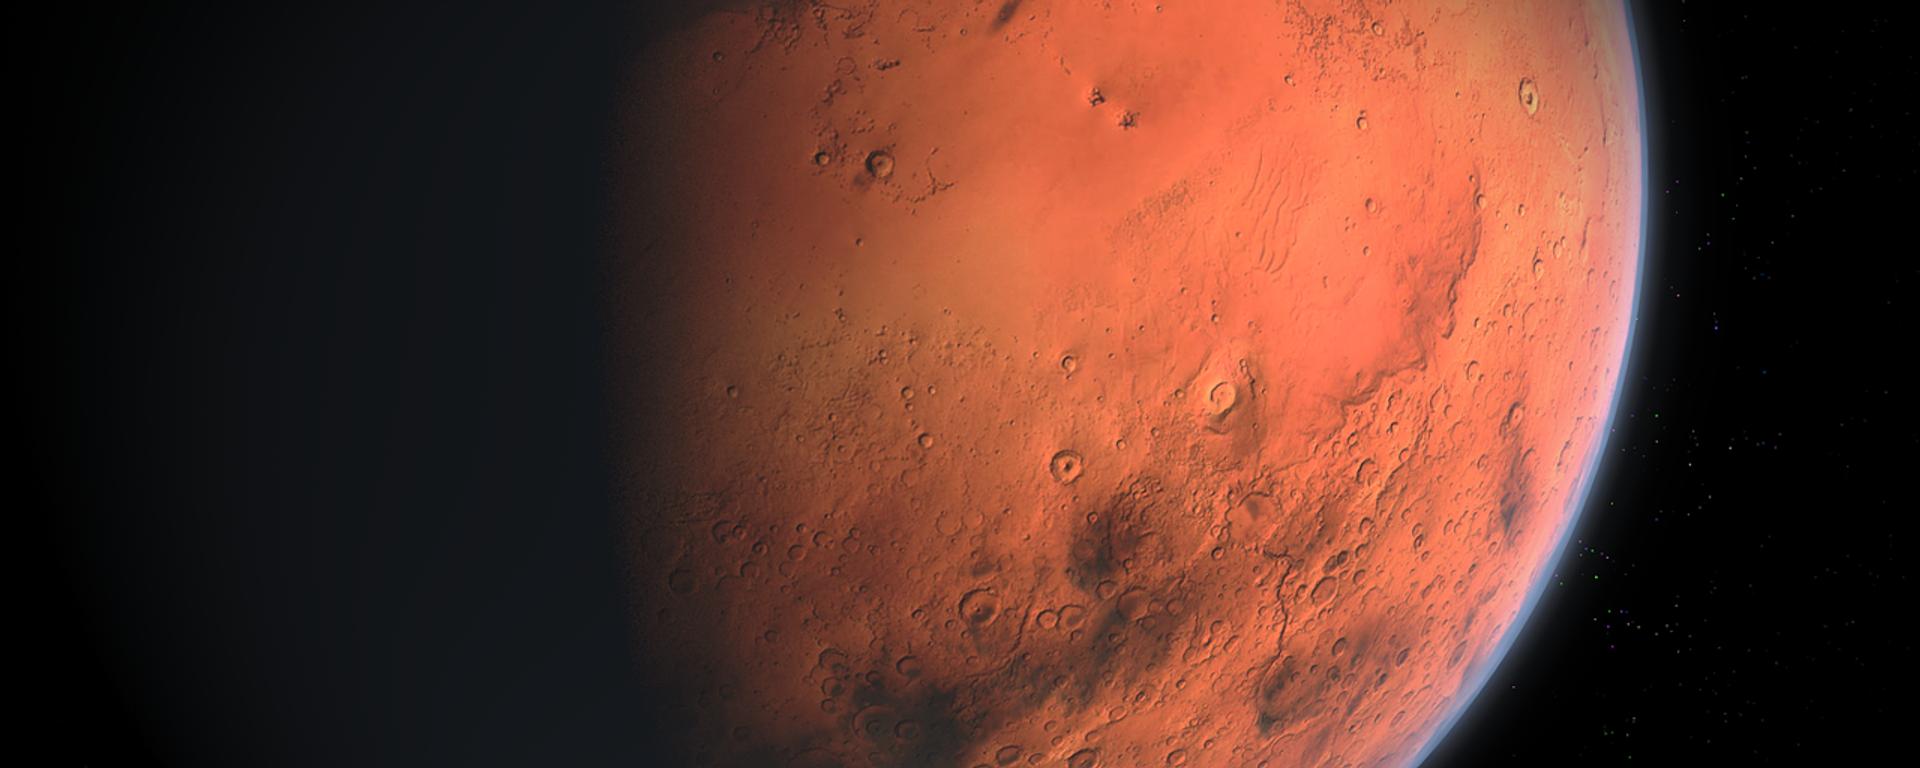 Mars (Symbolbild) - SNA, 1920, 24.02.2021